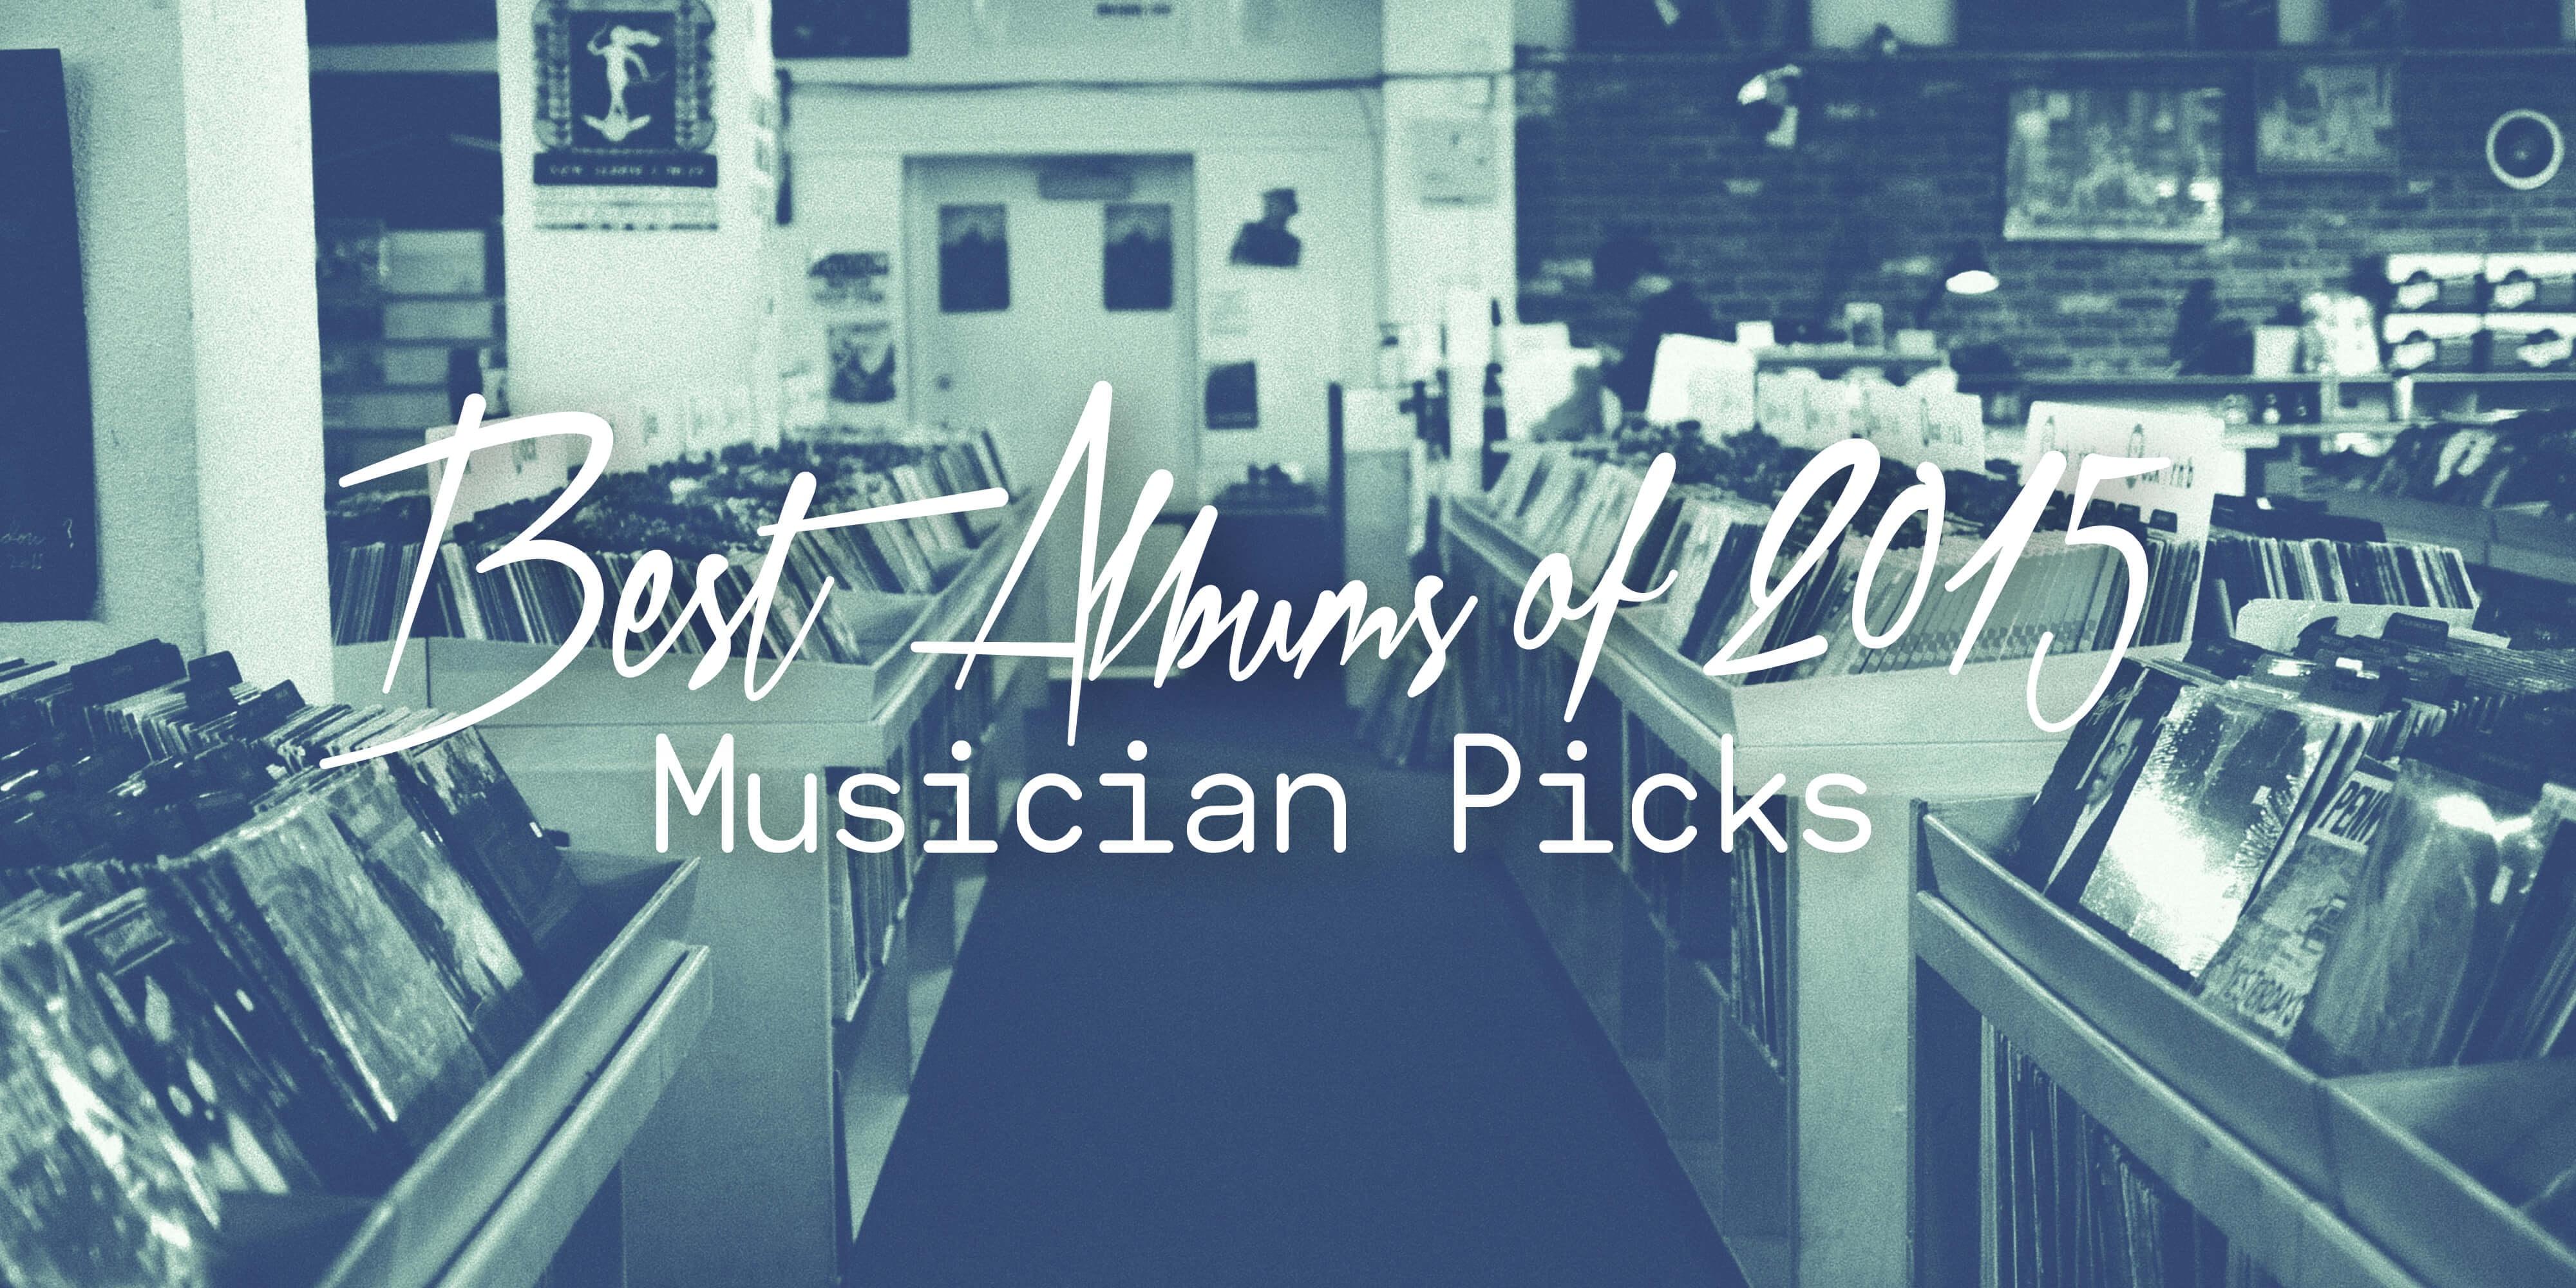 Best Albums of 2015: Musician Picks